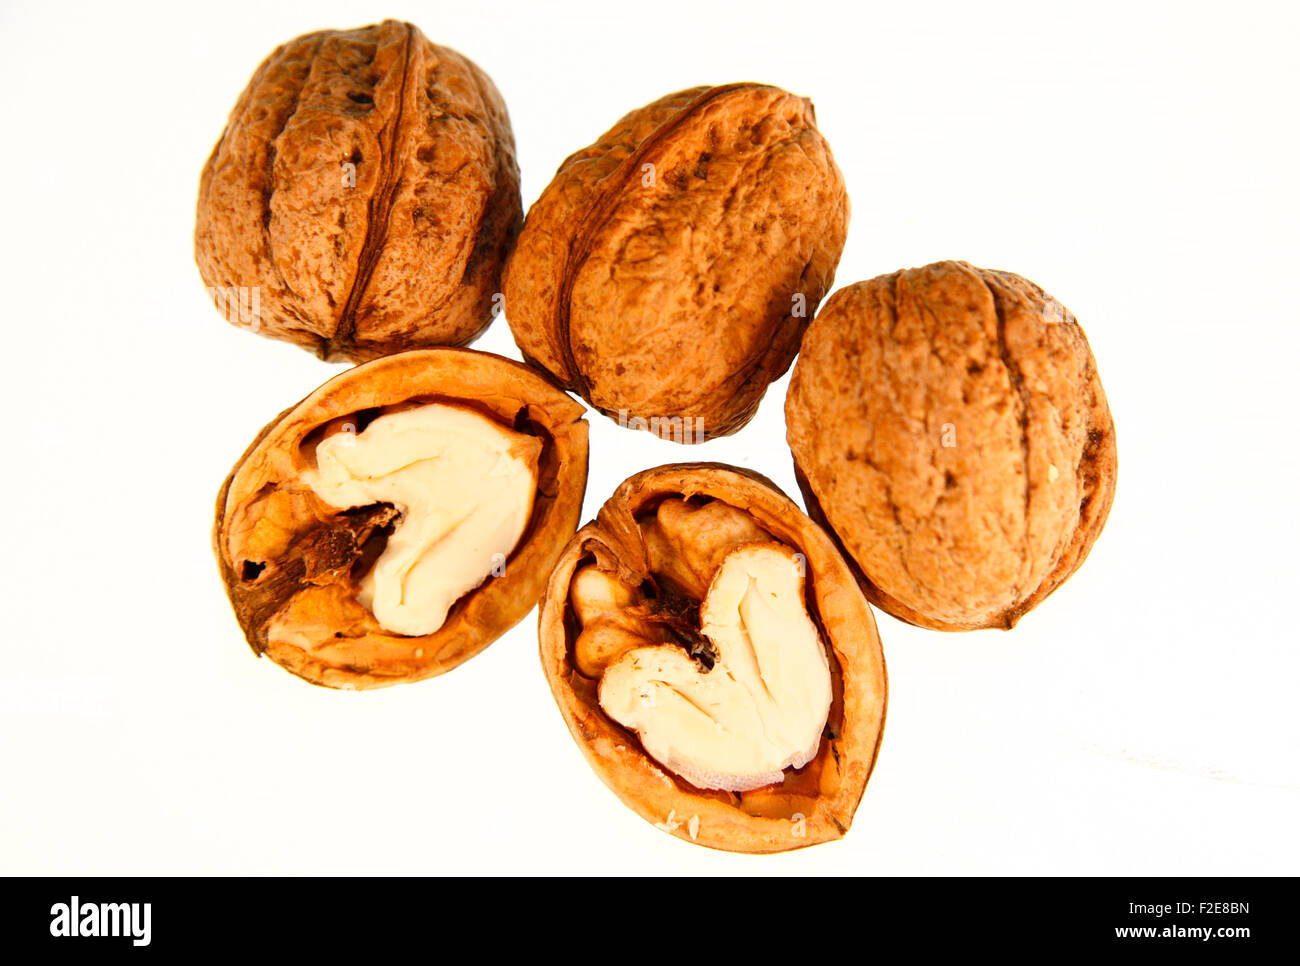 Nuesse / Walnuesse - Symbolbild Nahrungsmittel. Stock Photo